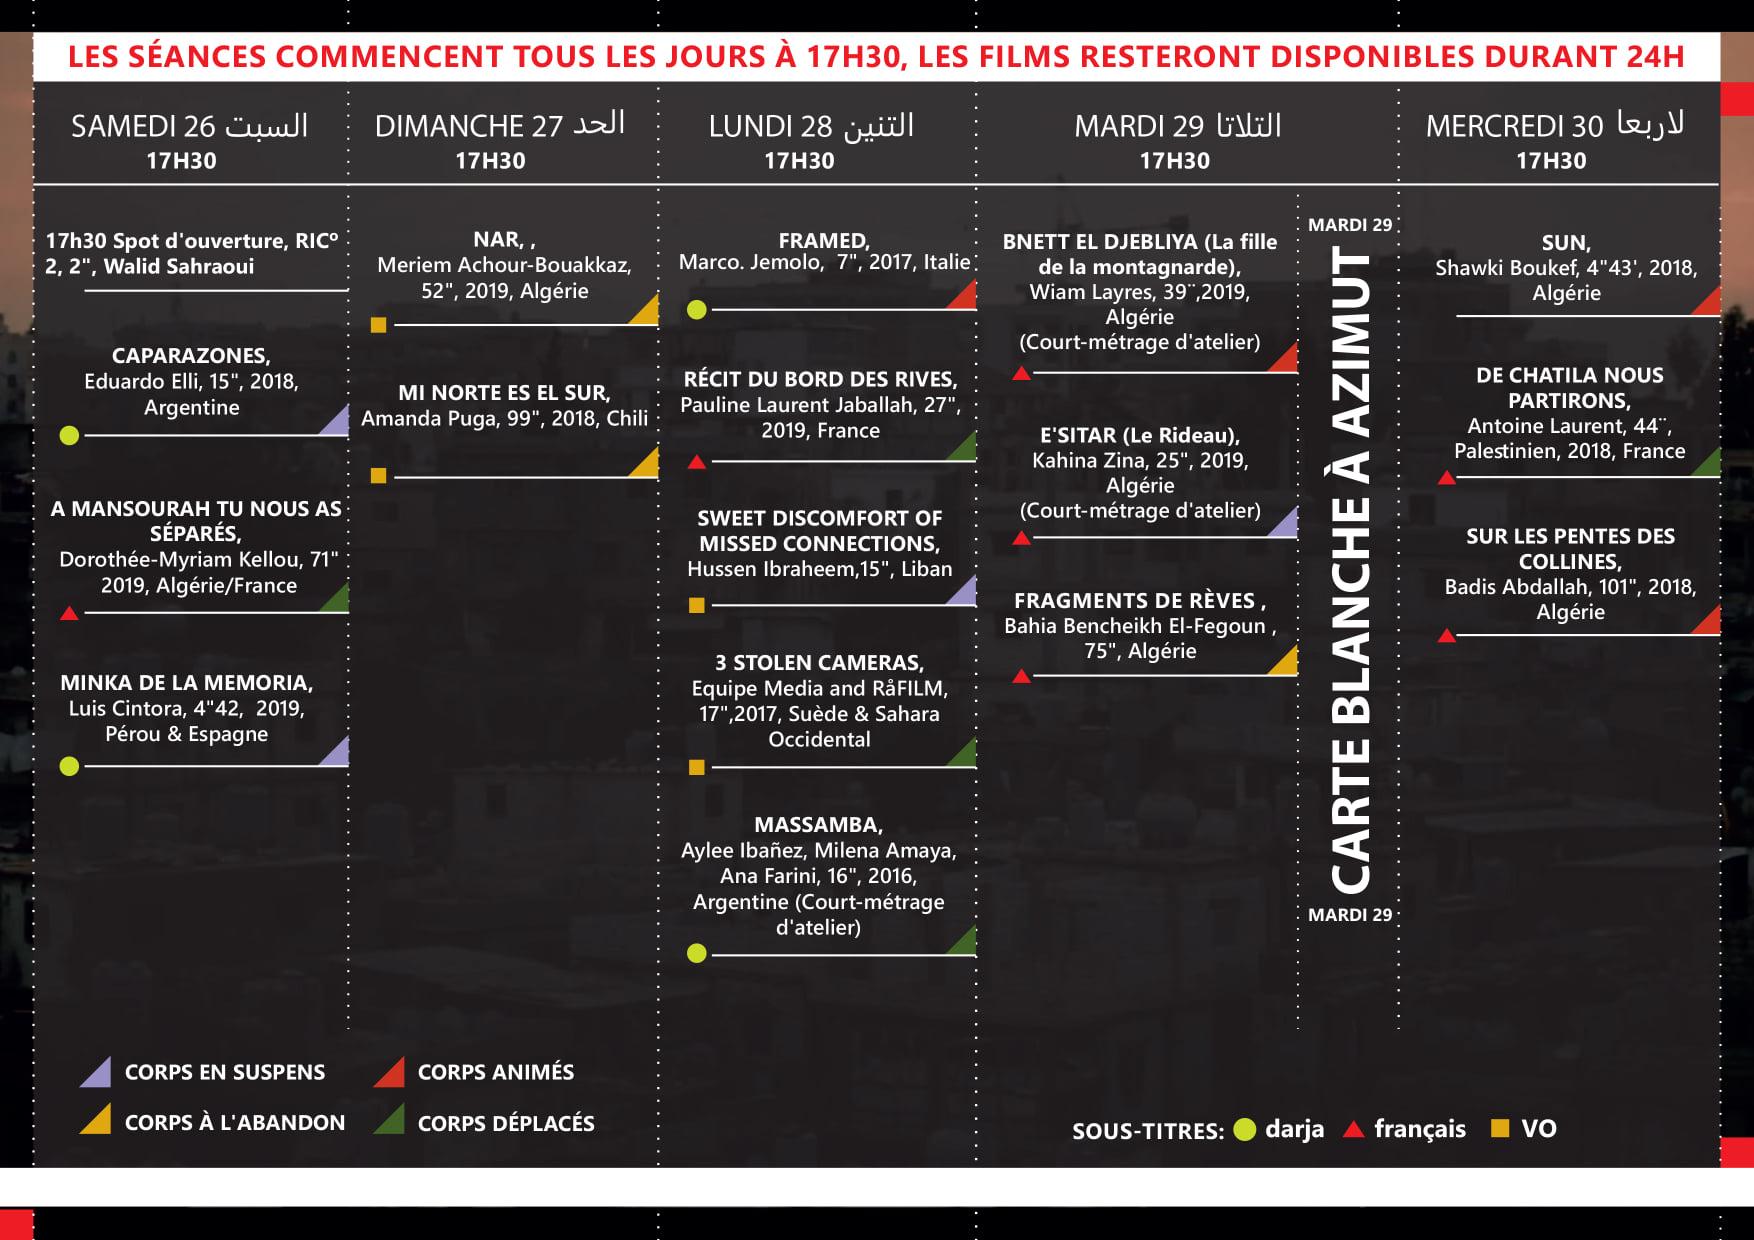 RICº, نظرة جديدة - Rencontres Internationales du Cinéma d'Oran